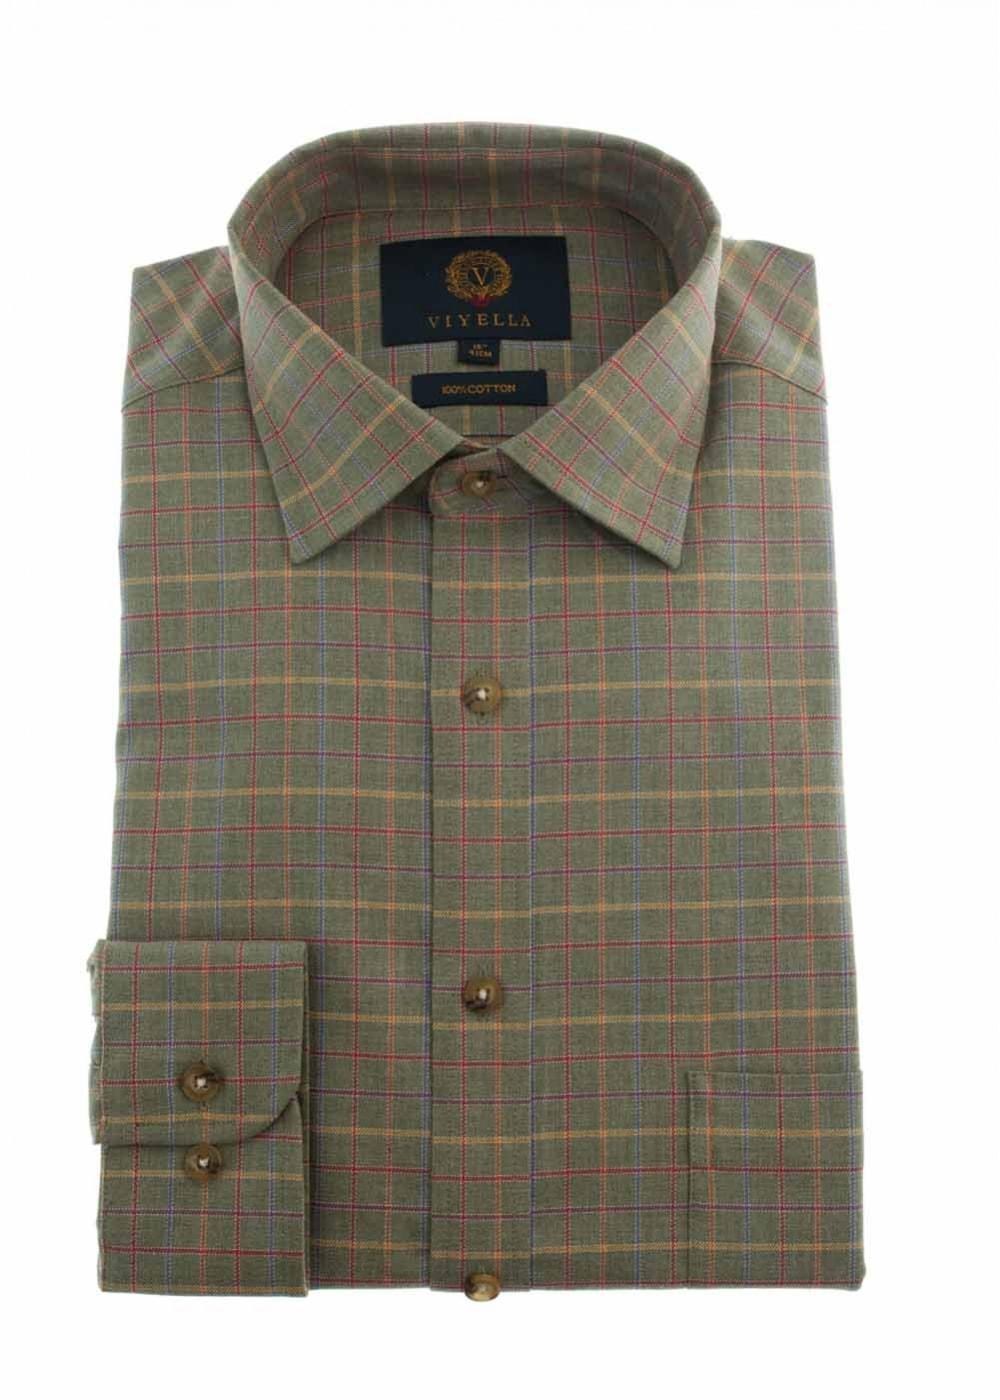 Mens Long Sleeve Polo Shirts With Pocket